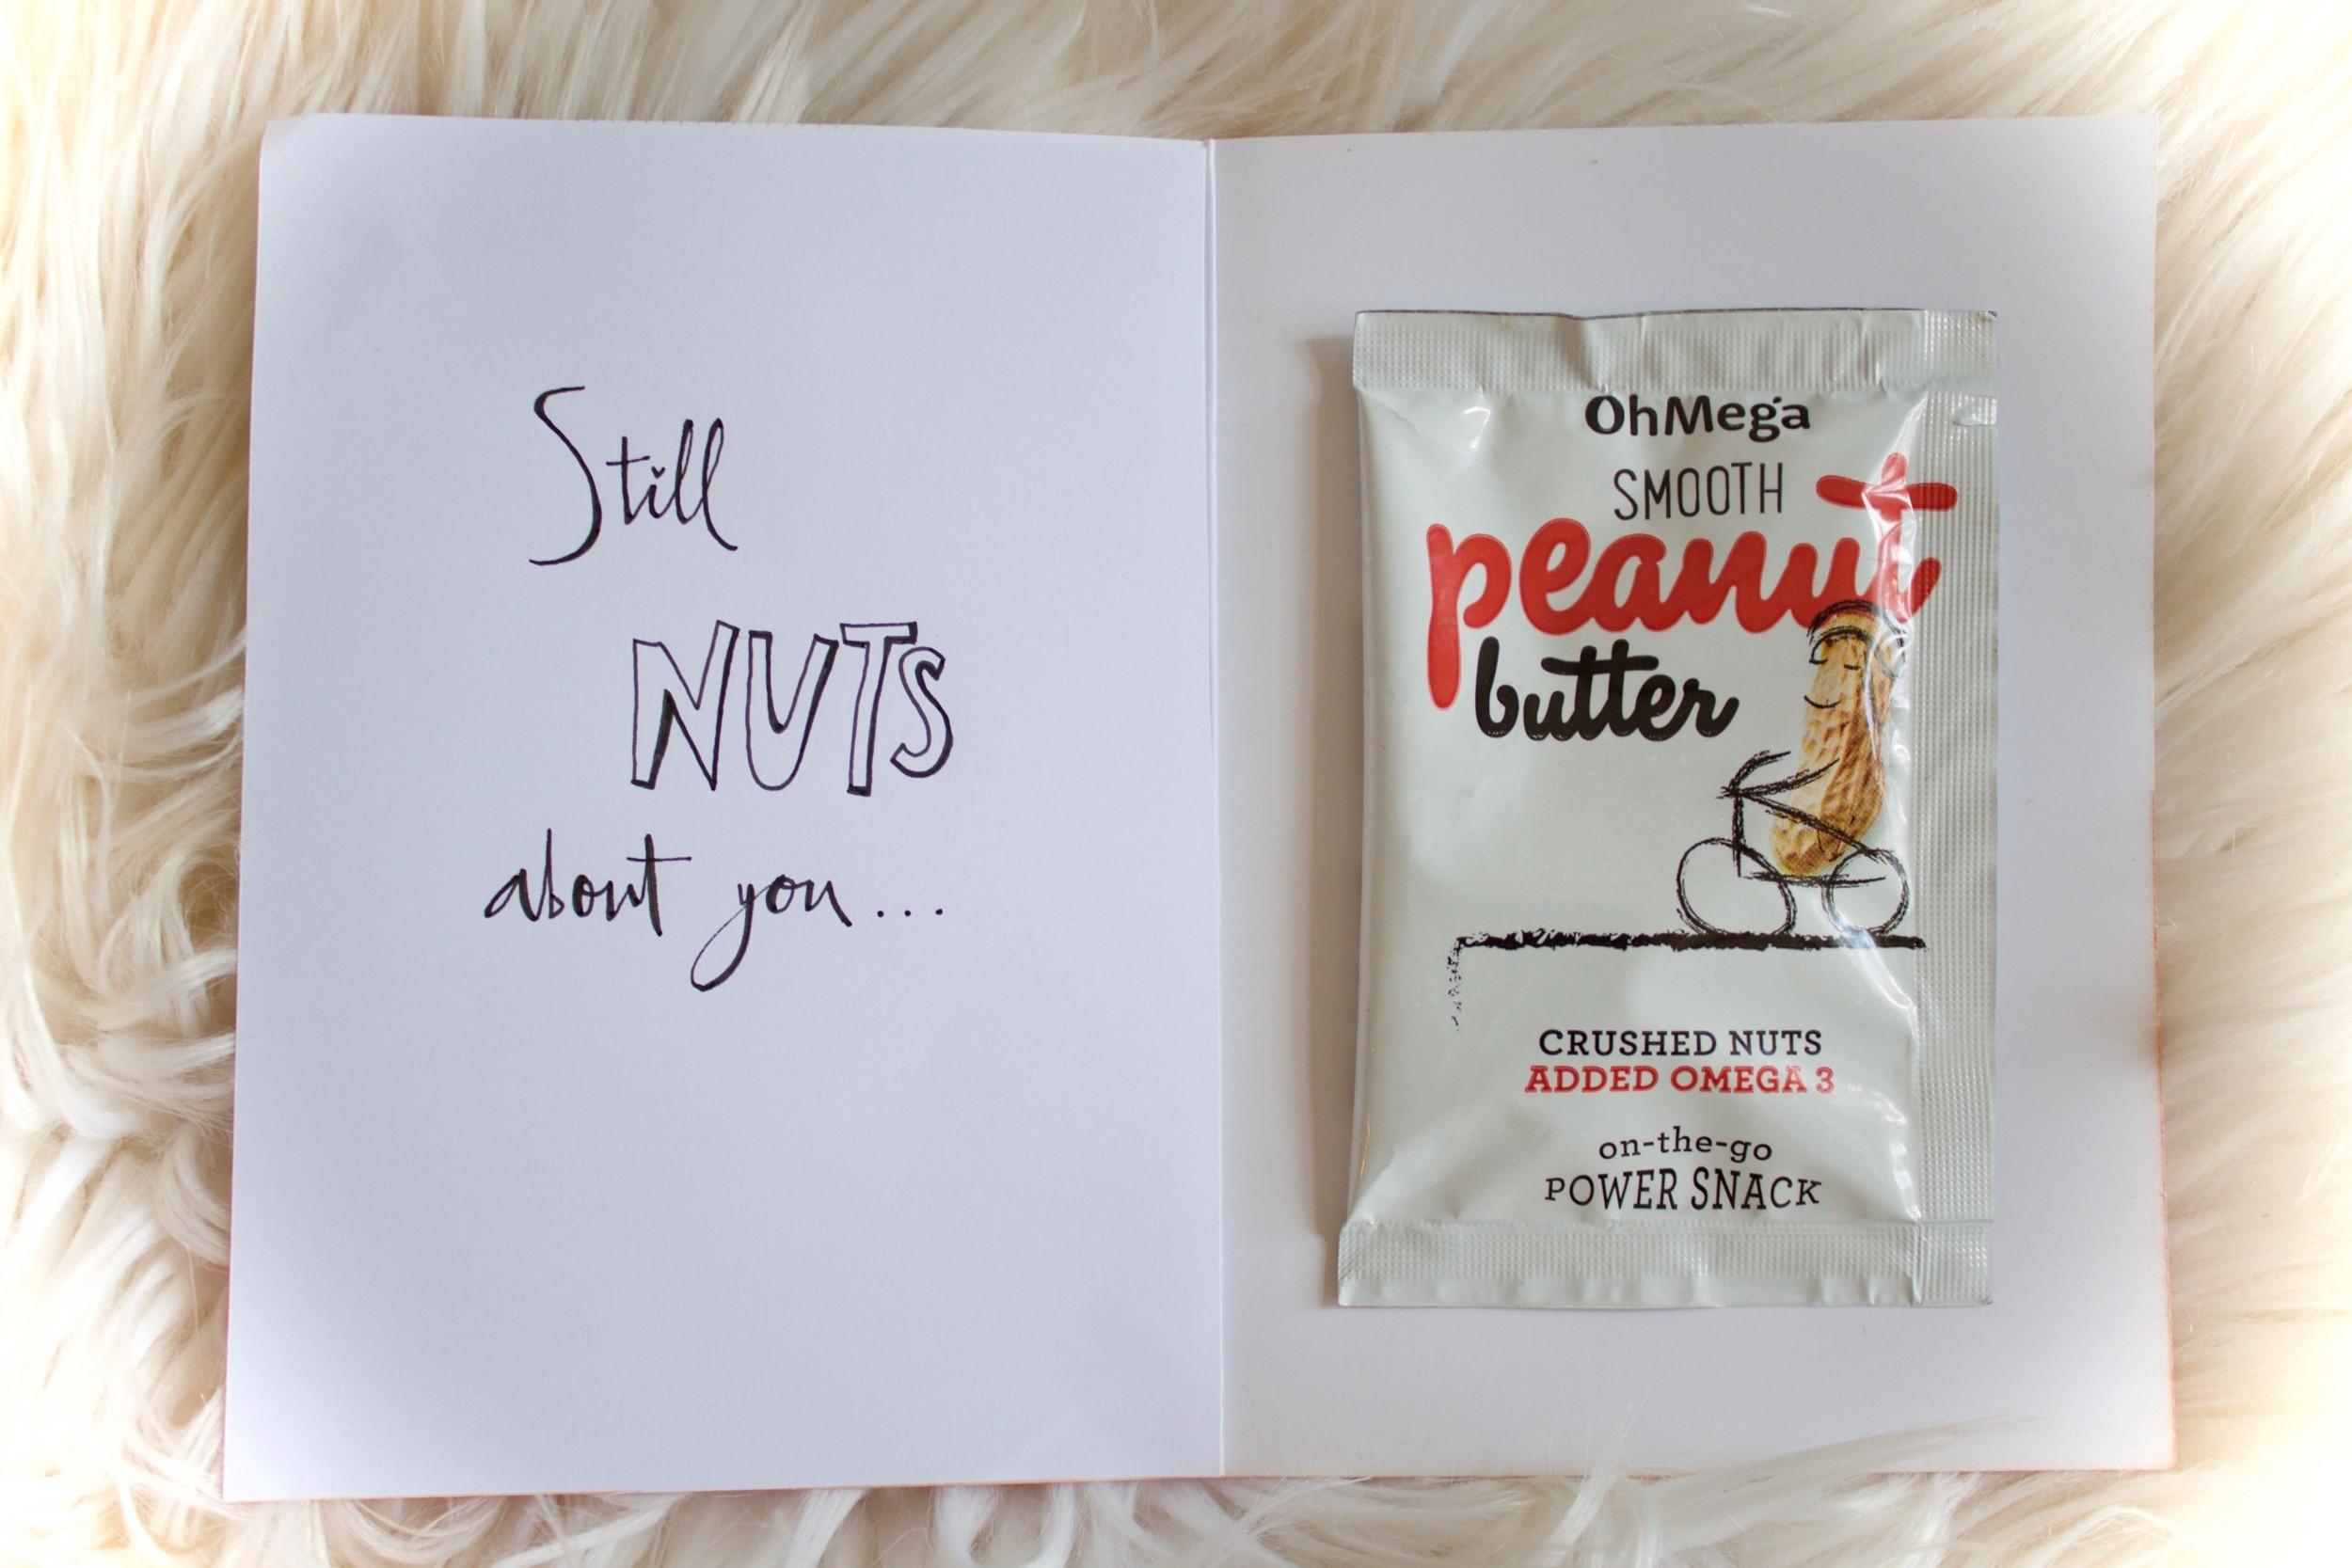 JustaMamma Valentines Day gift ideas peanut butter